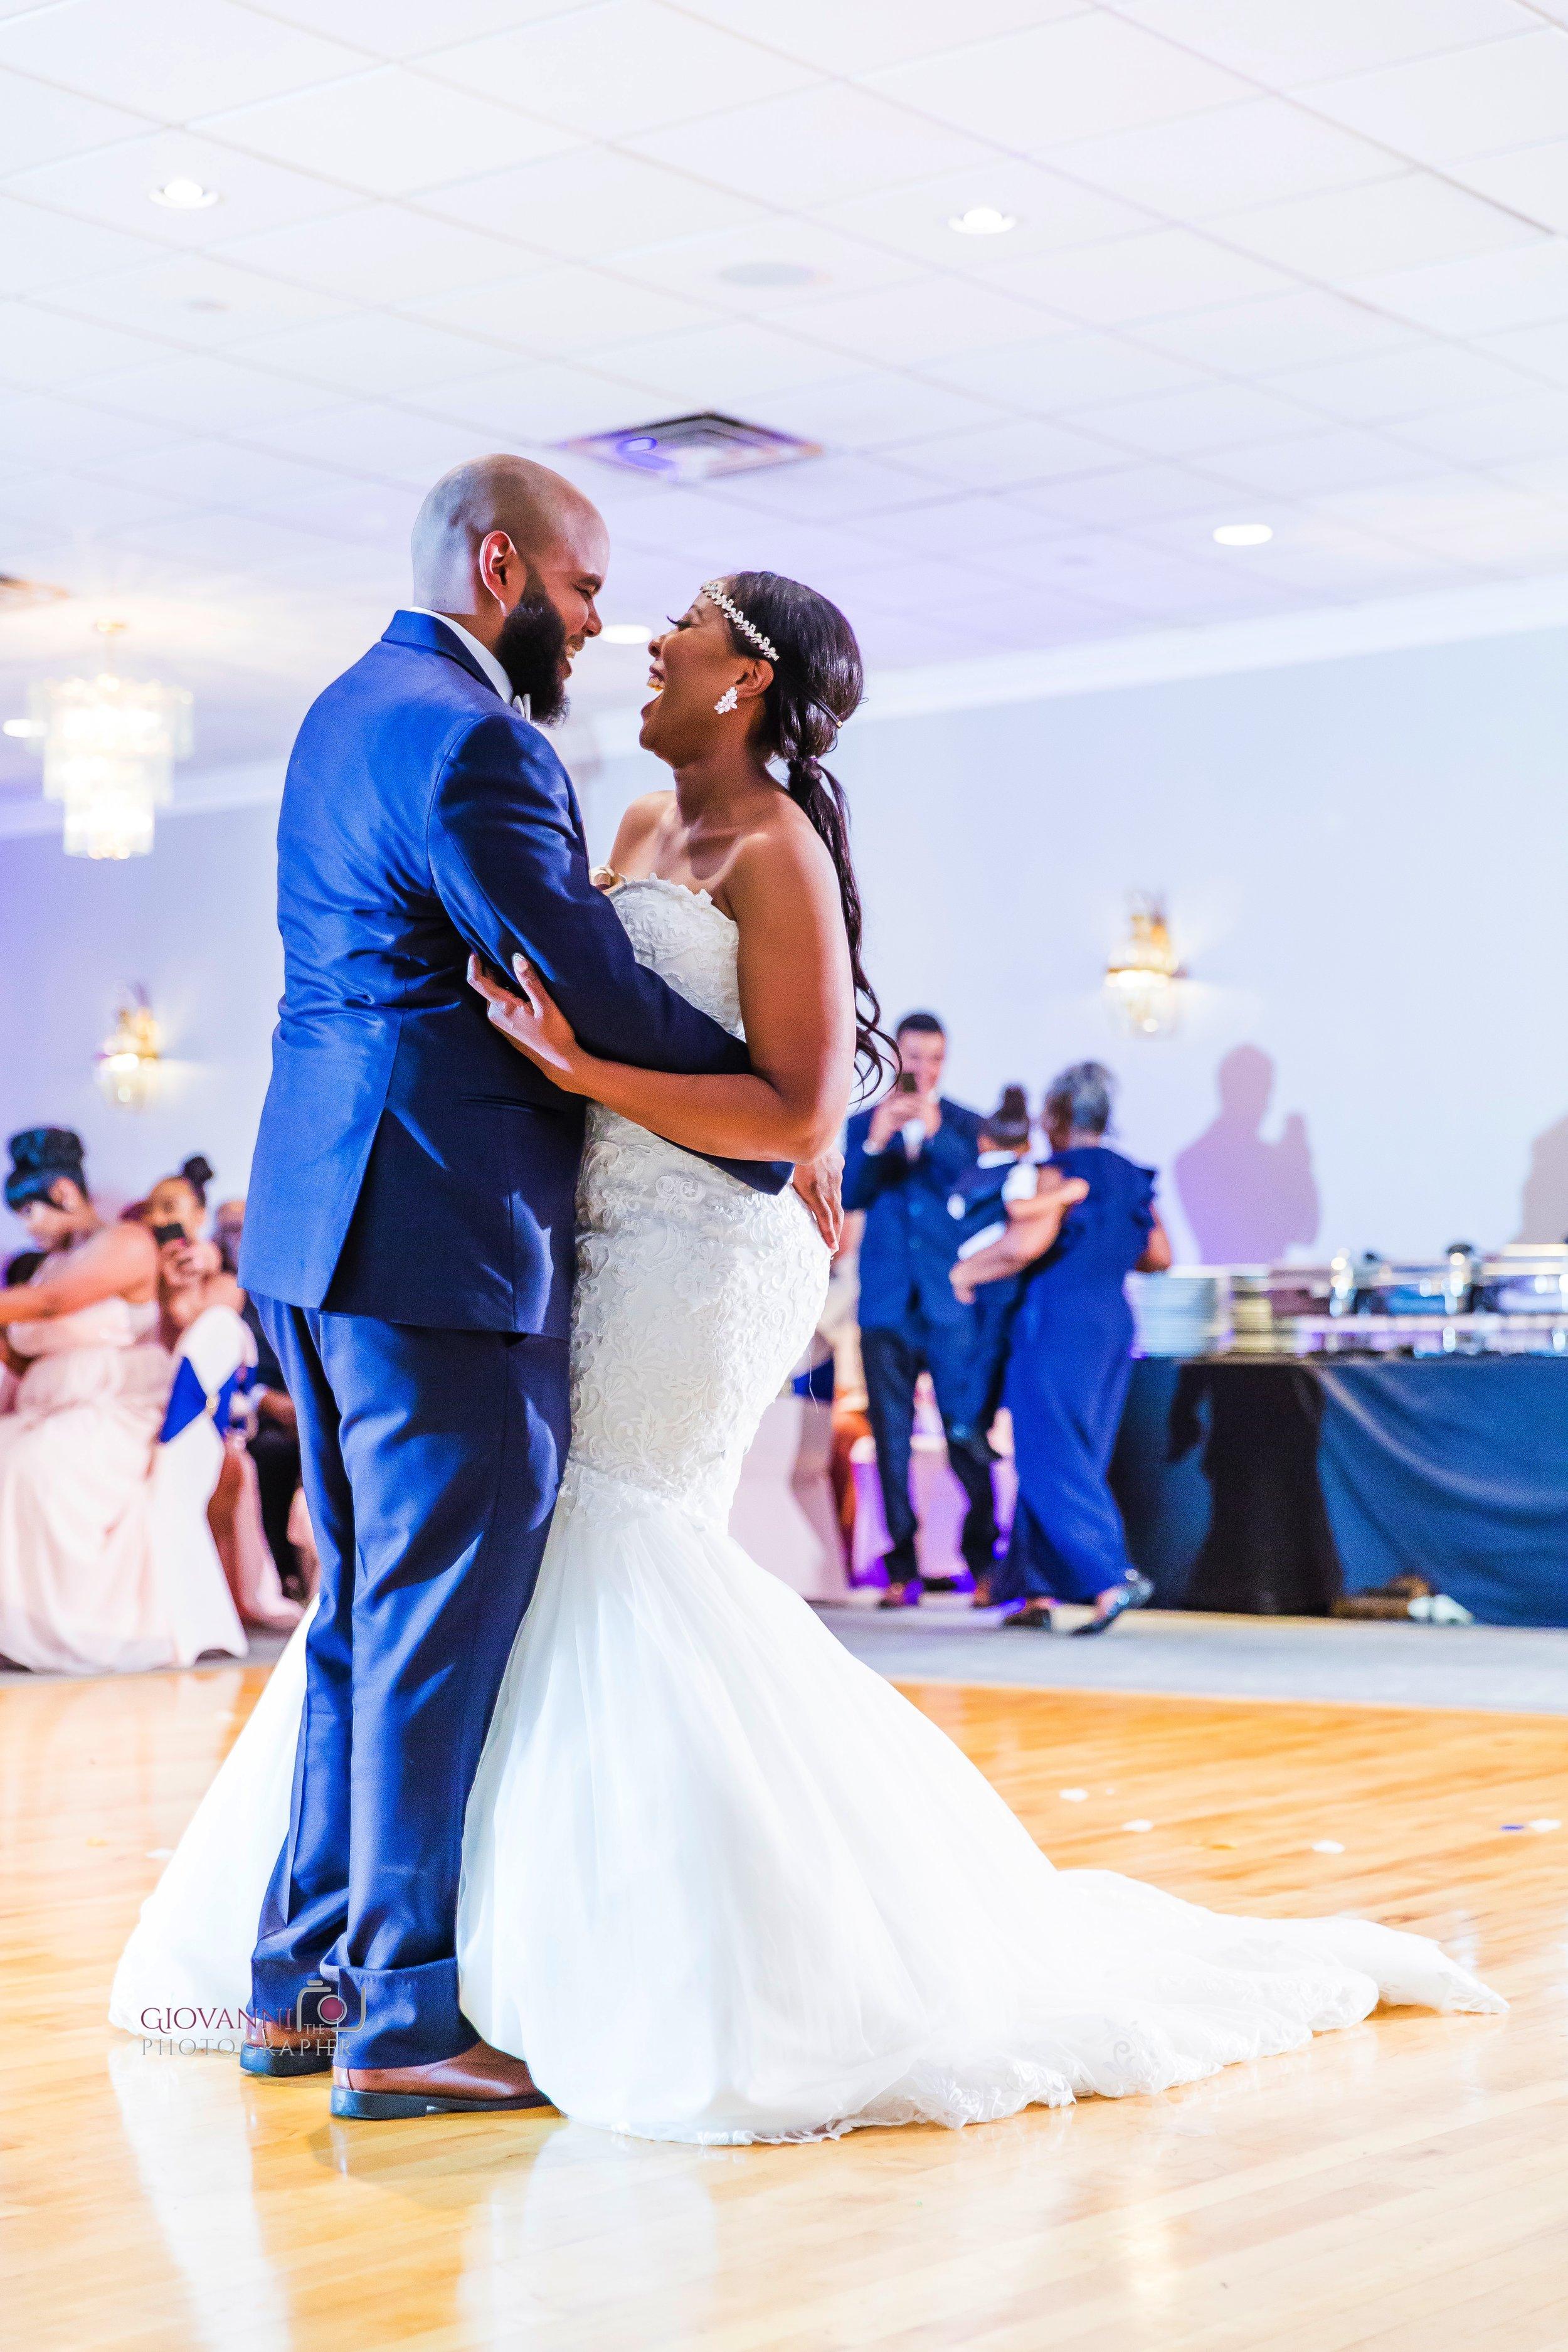 8C2A3832-Giovanni The Photographer-Best Boston Wedding Photography-Randolph Elks 2130 WM50.jpg